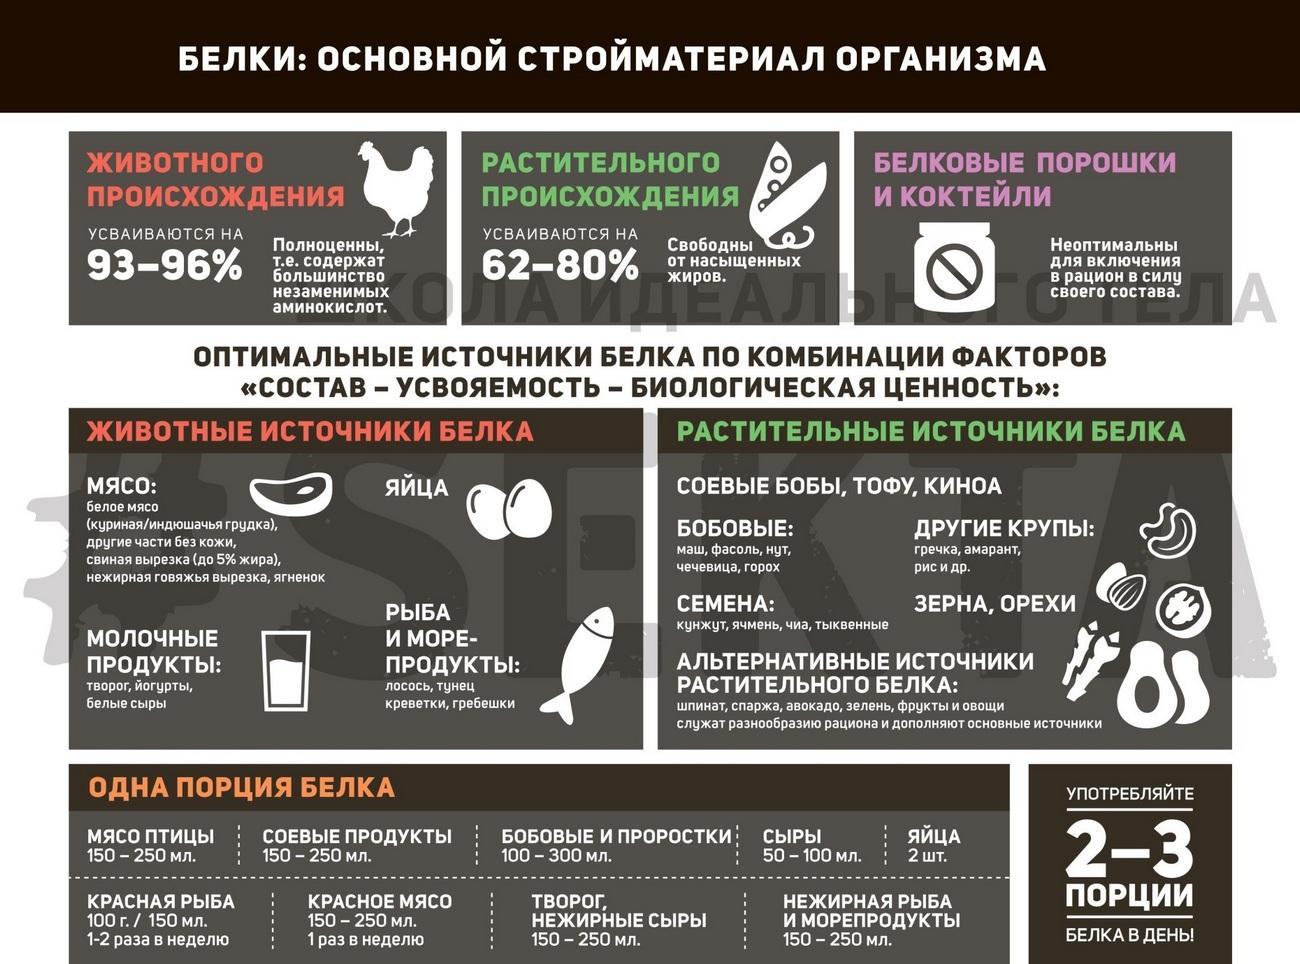 Белок инфографика